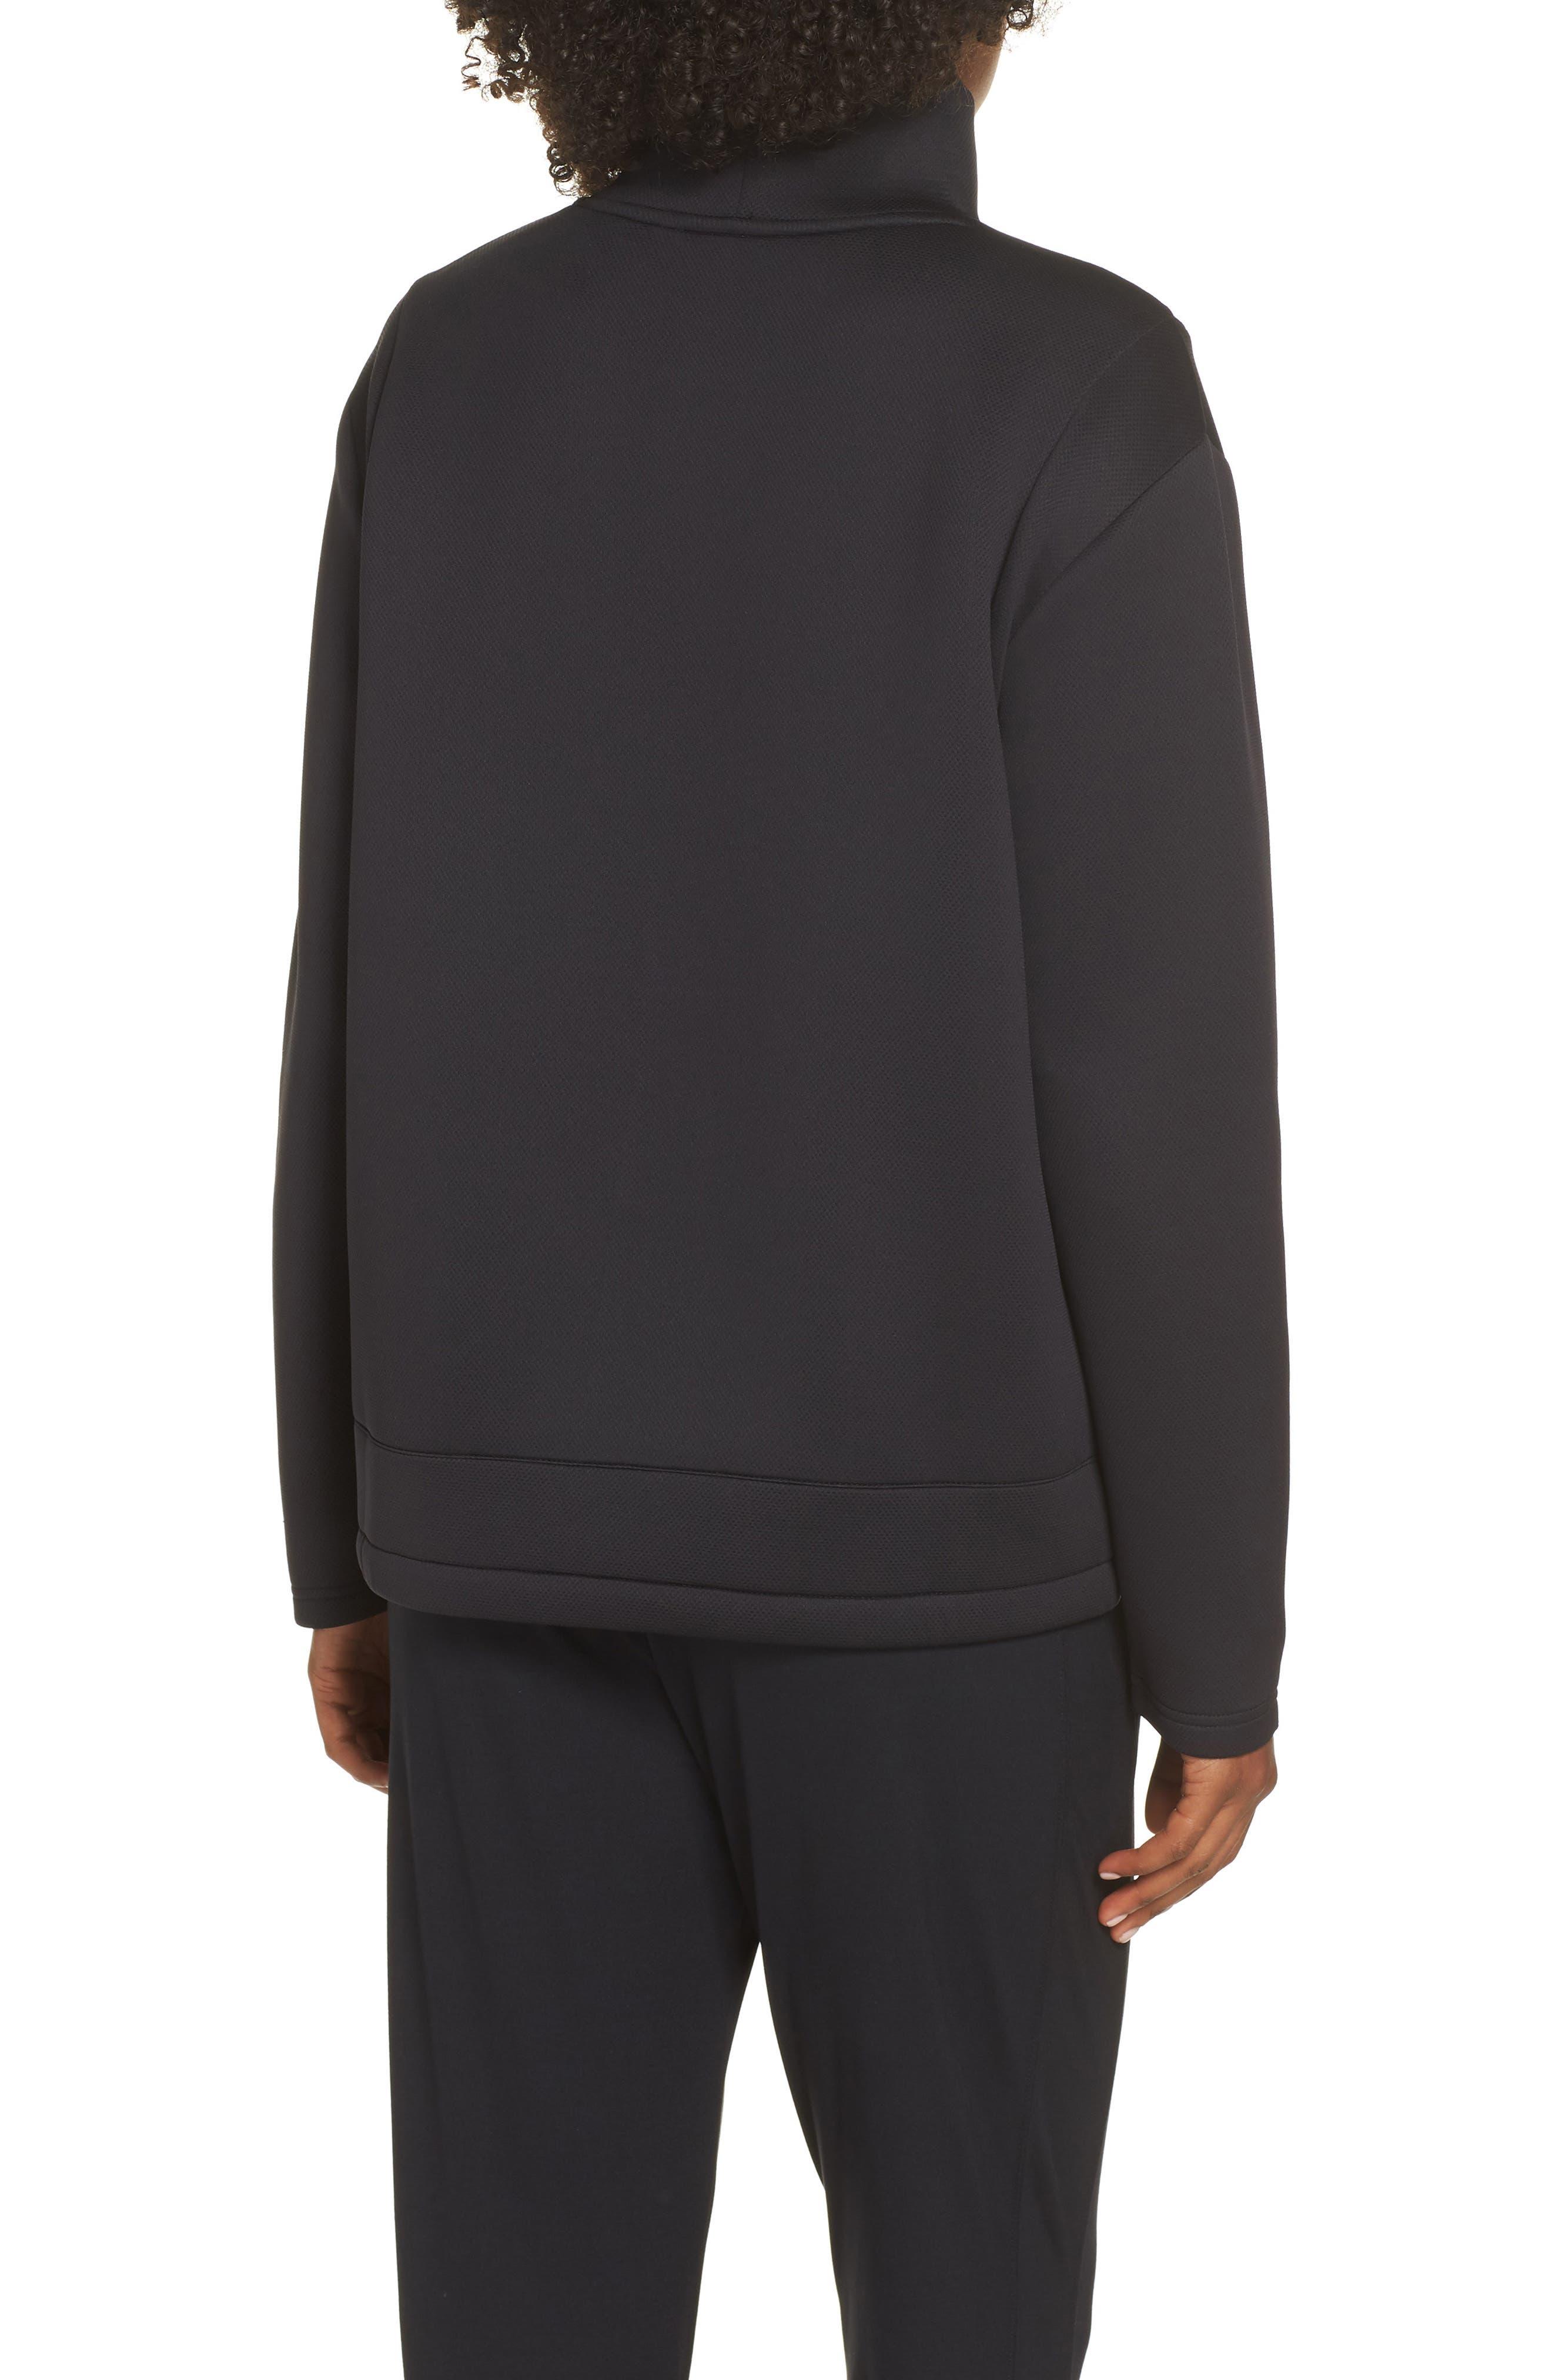 All About It Funnel Neck Sweatshirt,                             Alternate thumbnail 2, color,                             BLACK